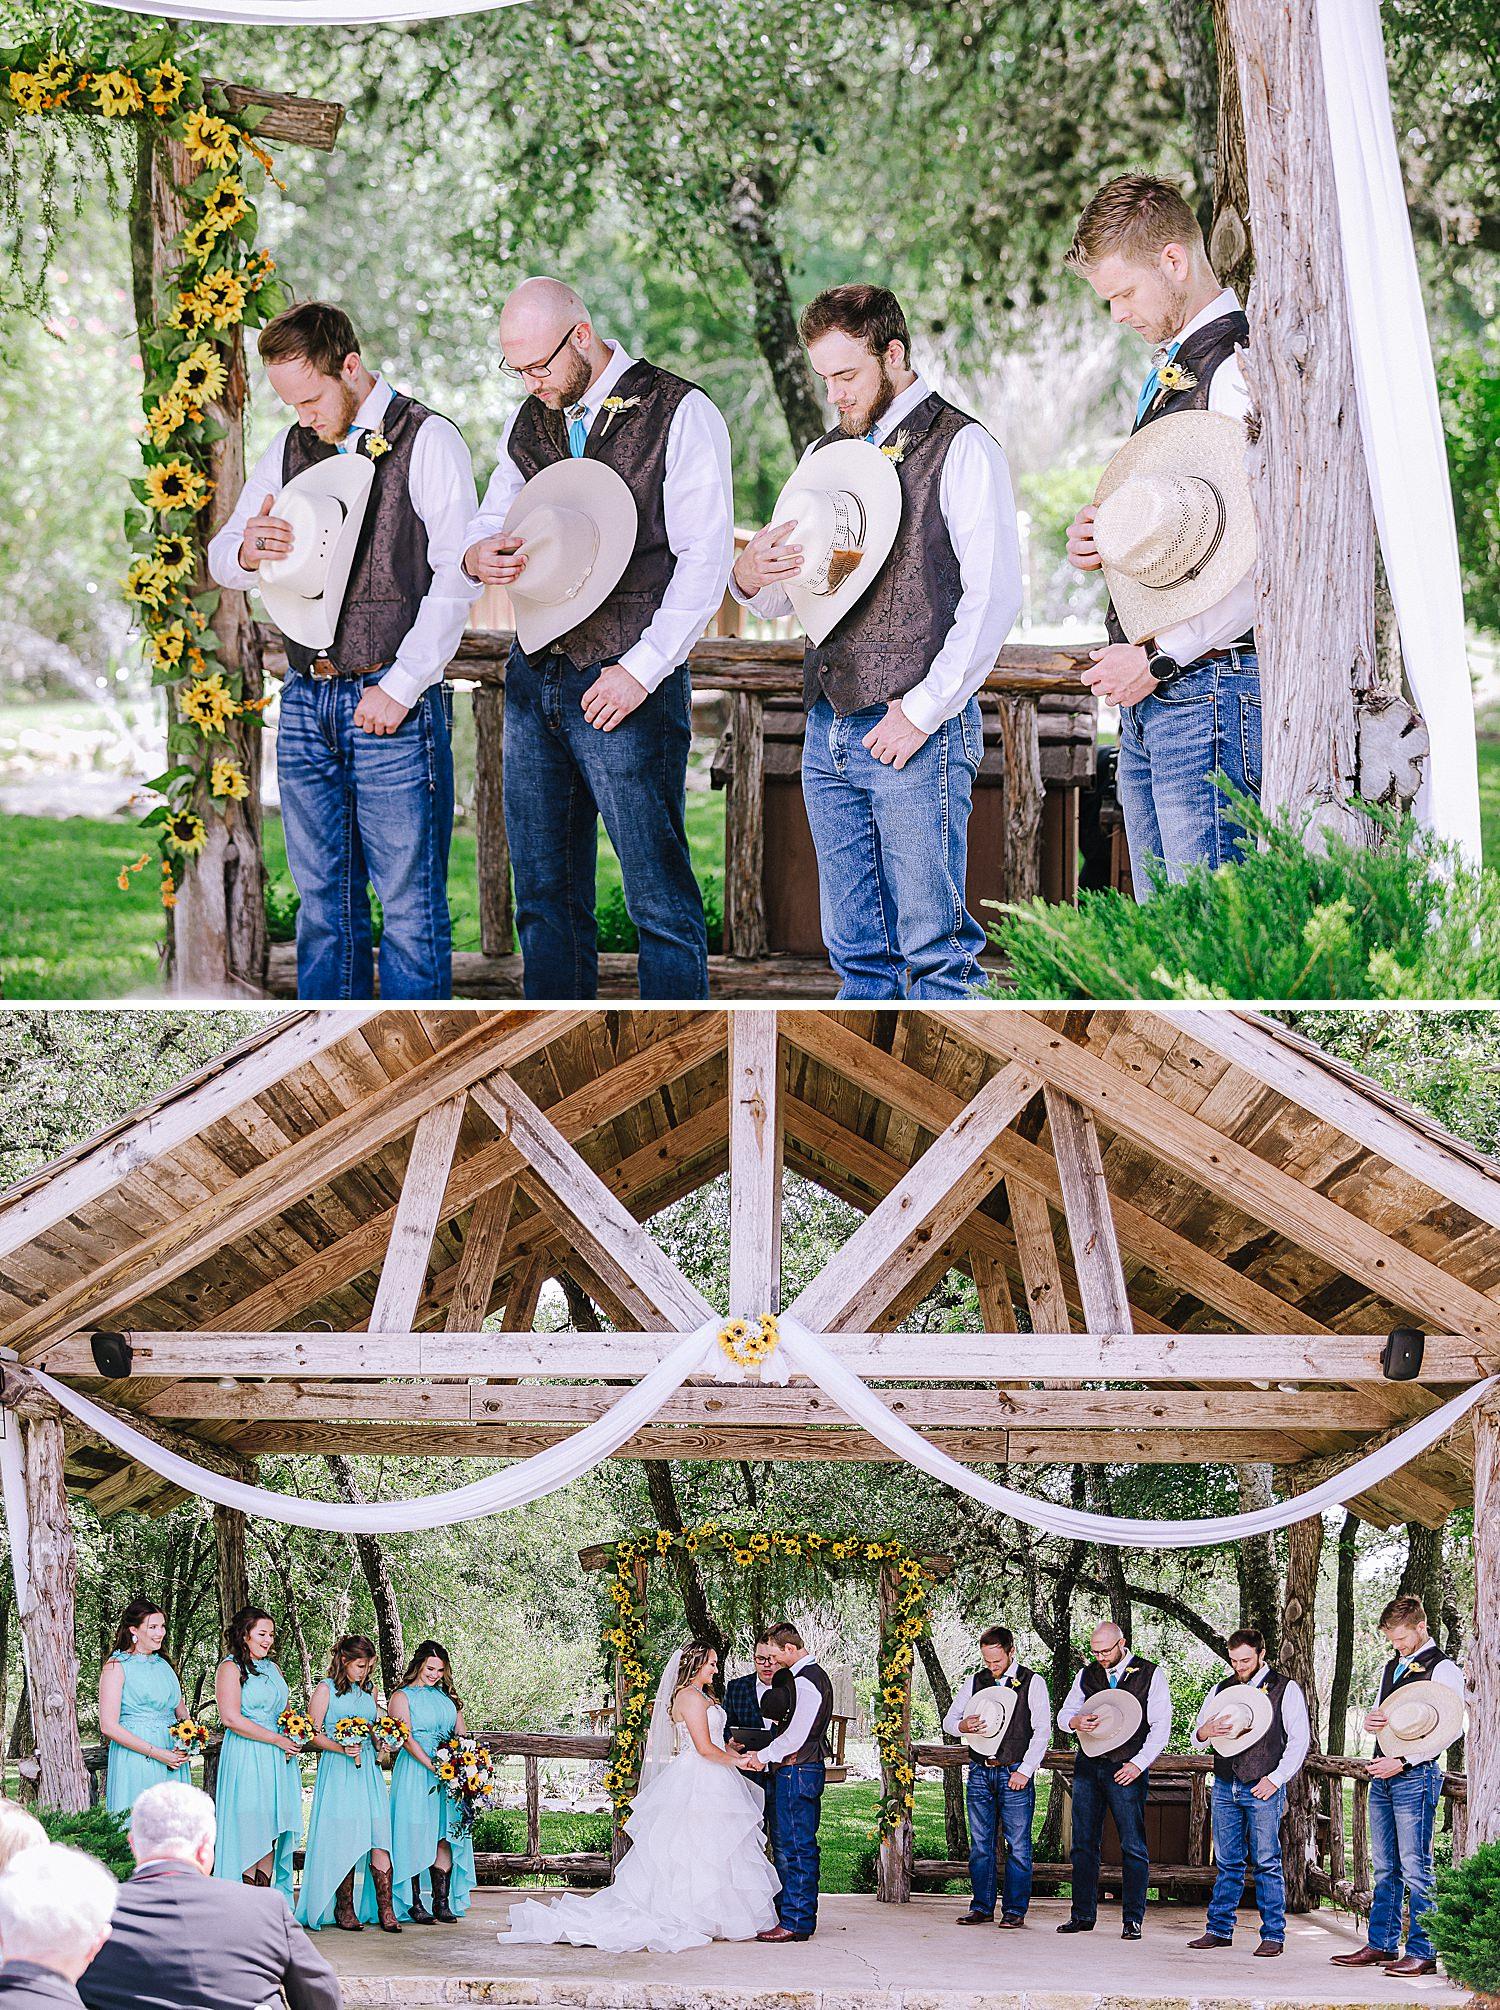 Carly-Barton-Photography-Old-Town-Texas-Rustic-Wedding-Photos-Sunflowers-Boots-Kyle-Texas_0044.jpg